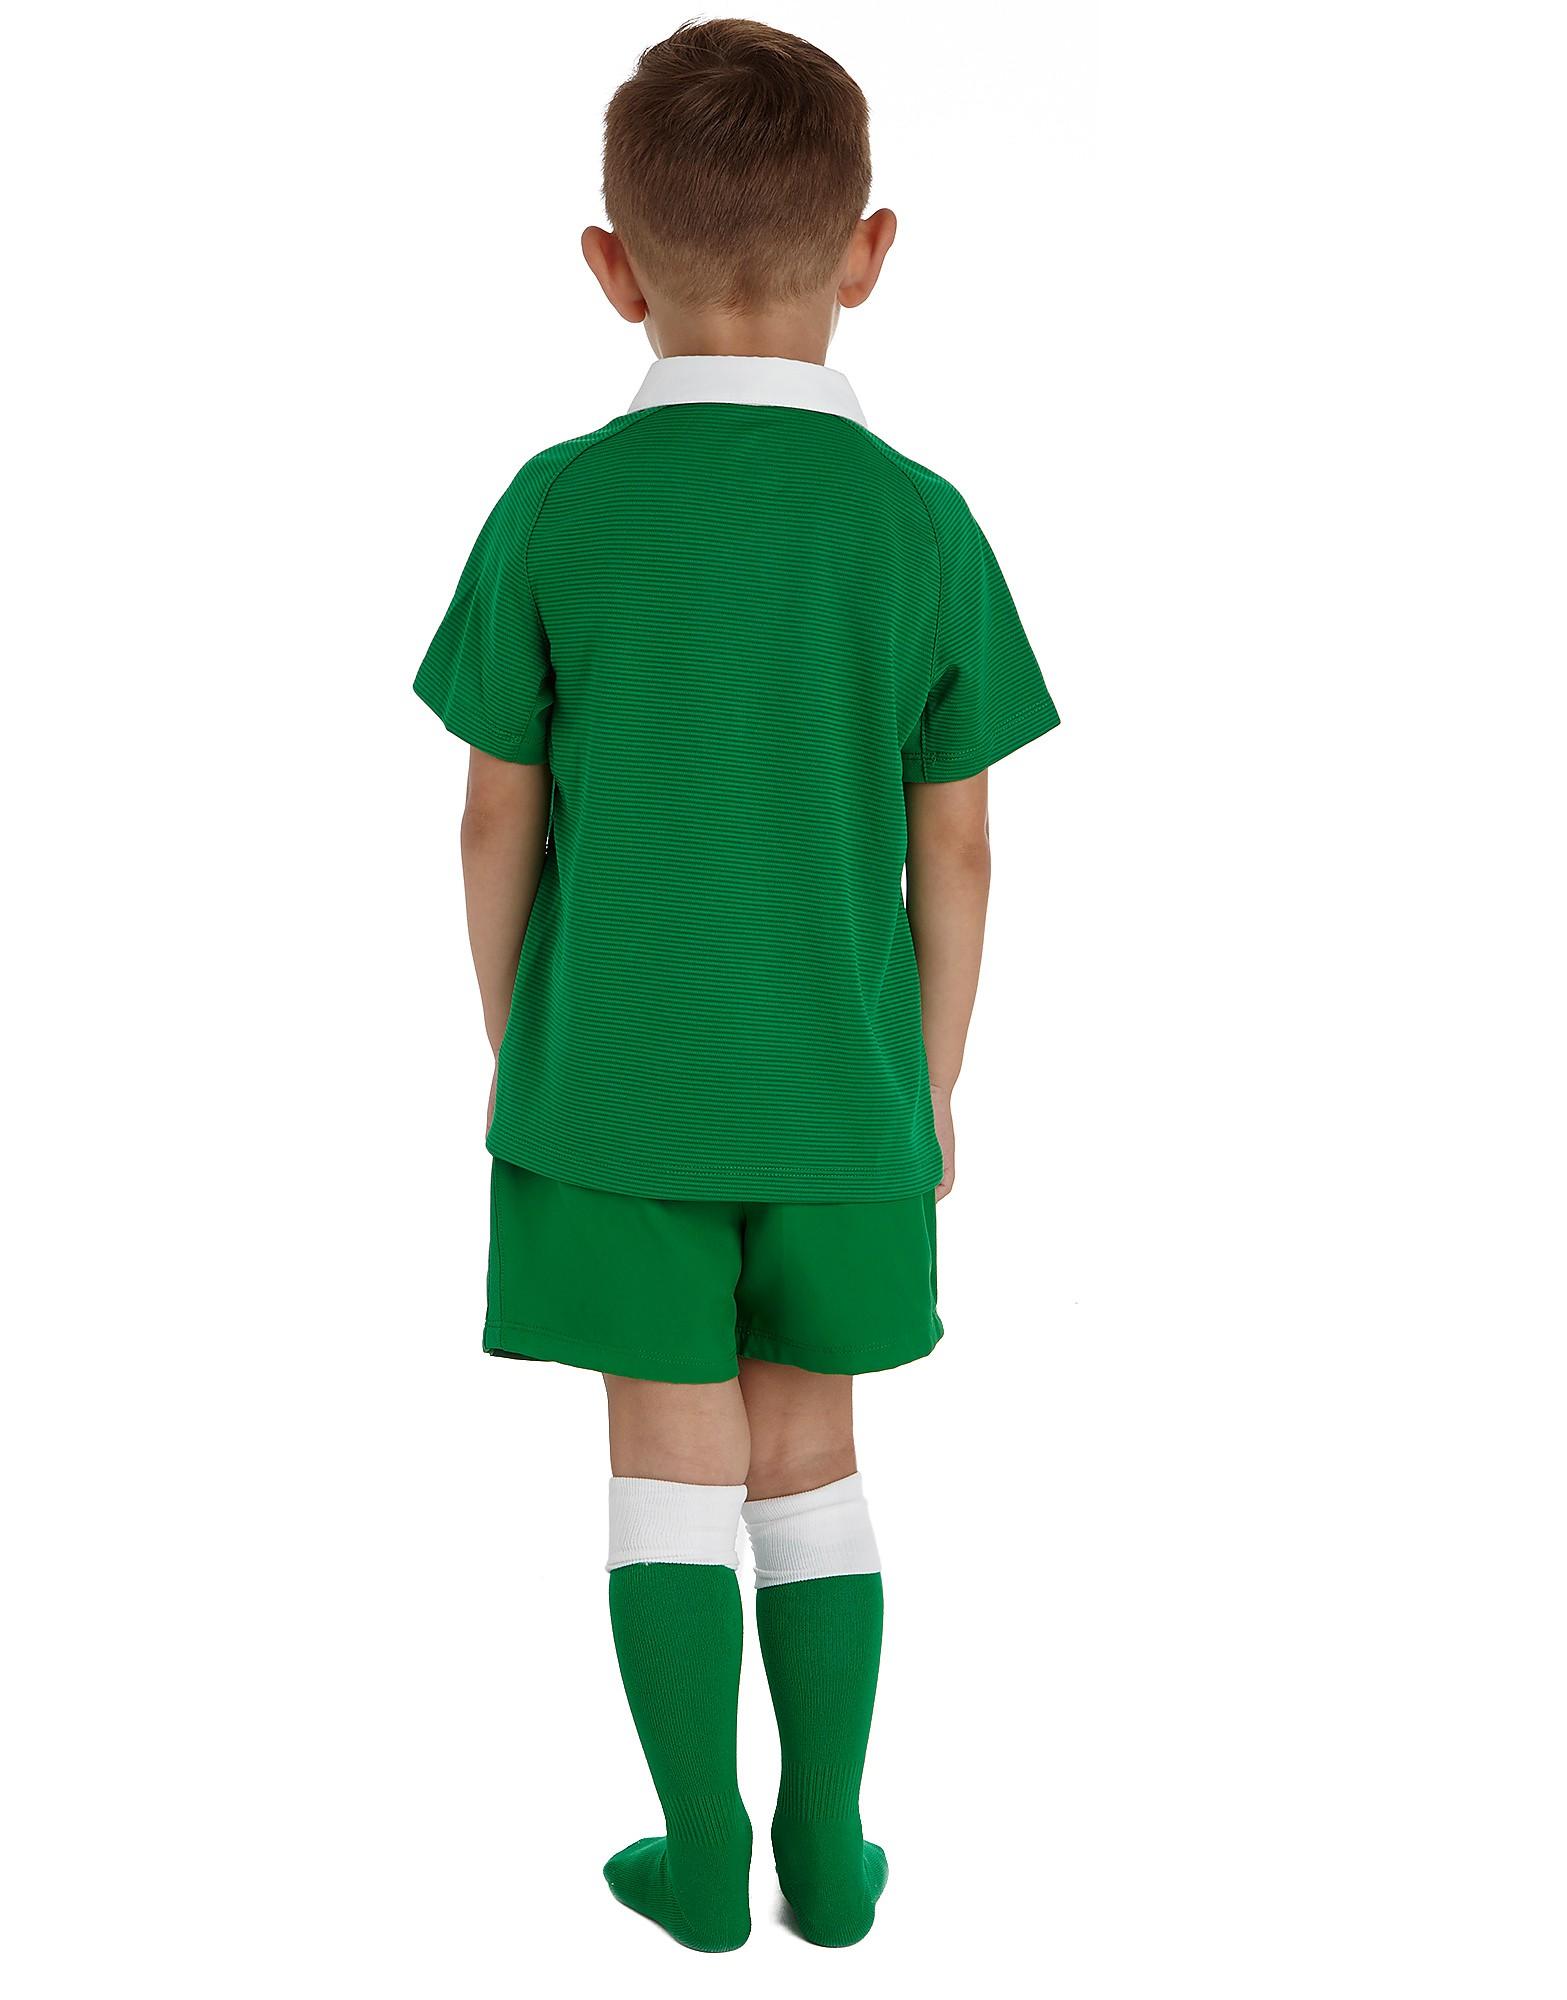 Umbro Republic of Ireland 2014 Childrens Home Kit